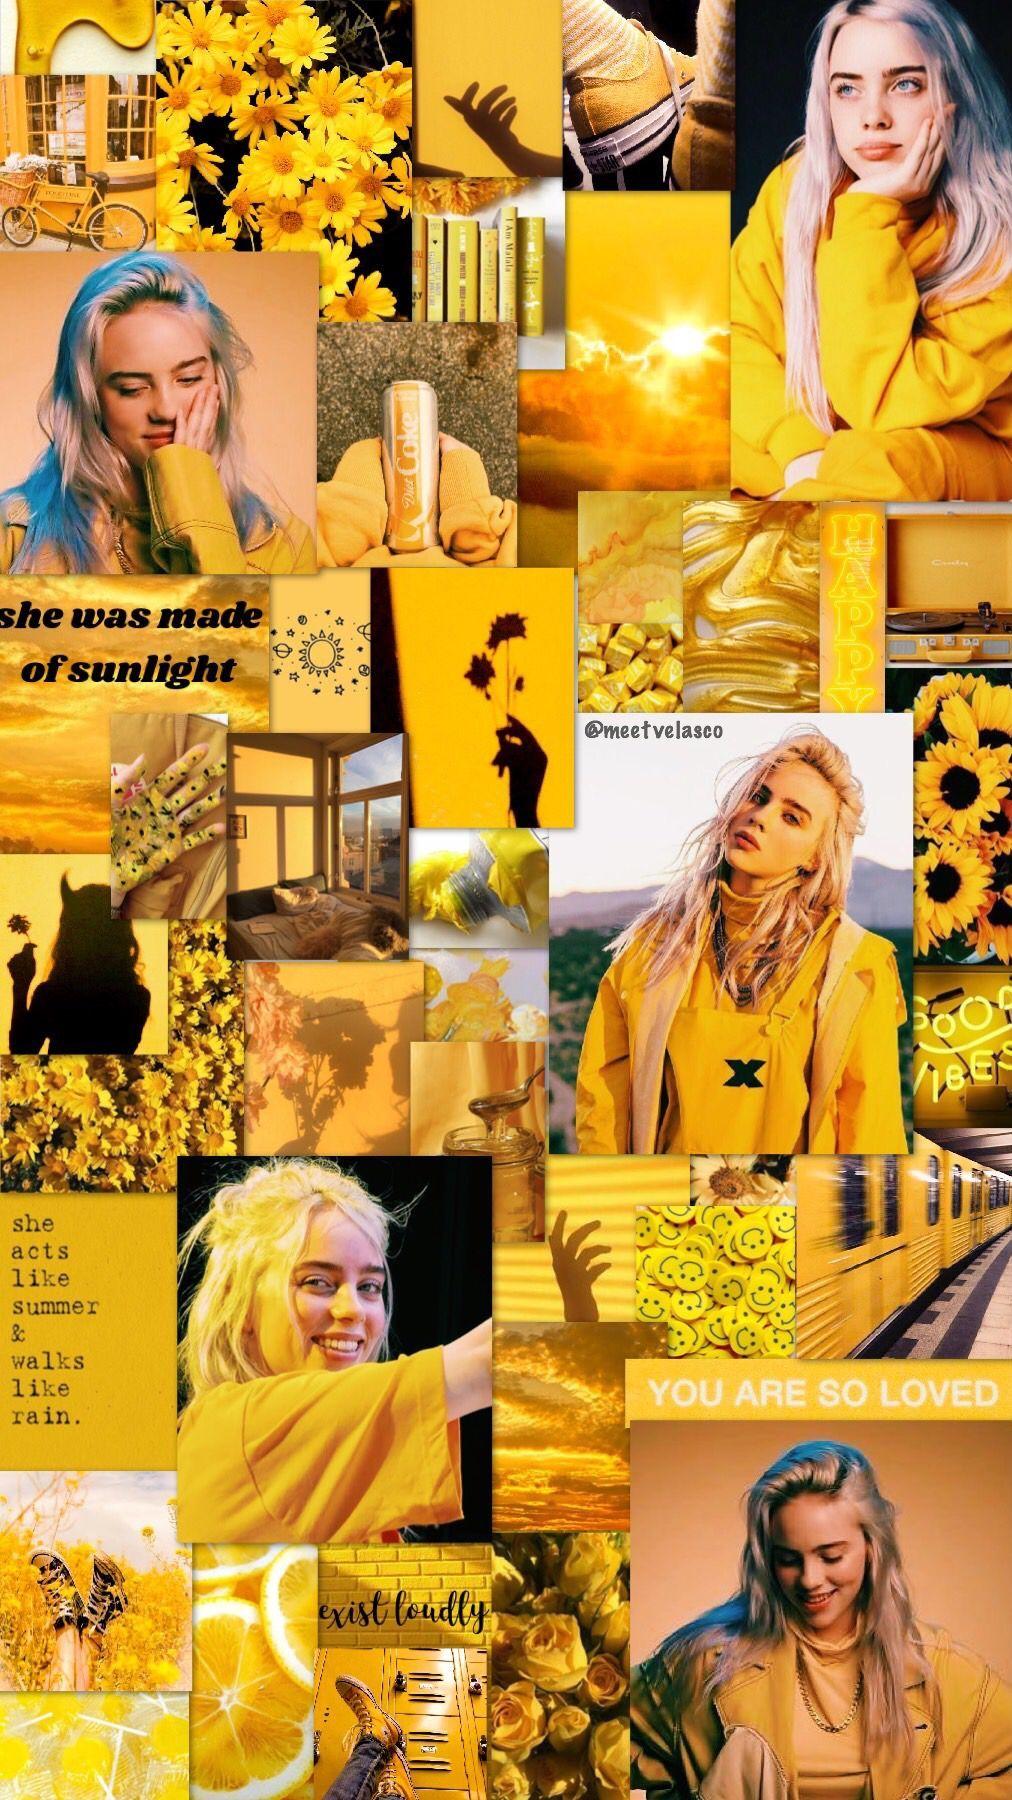 Billie Eilish Lockscreen Wallpaper Fondo In 2020 Billie Billie Eilish Cute Wallpapers